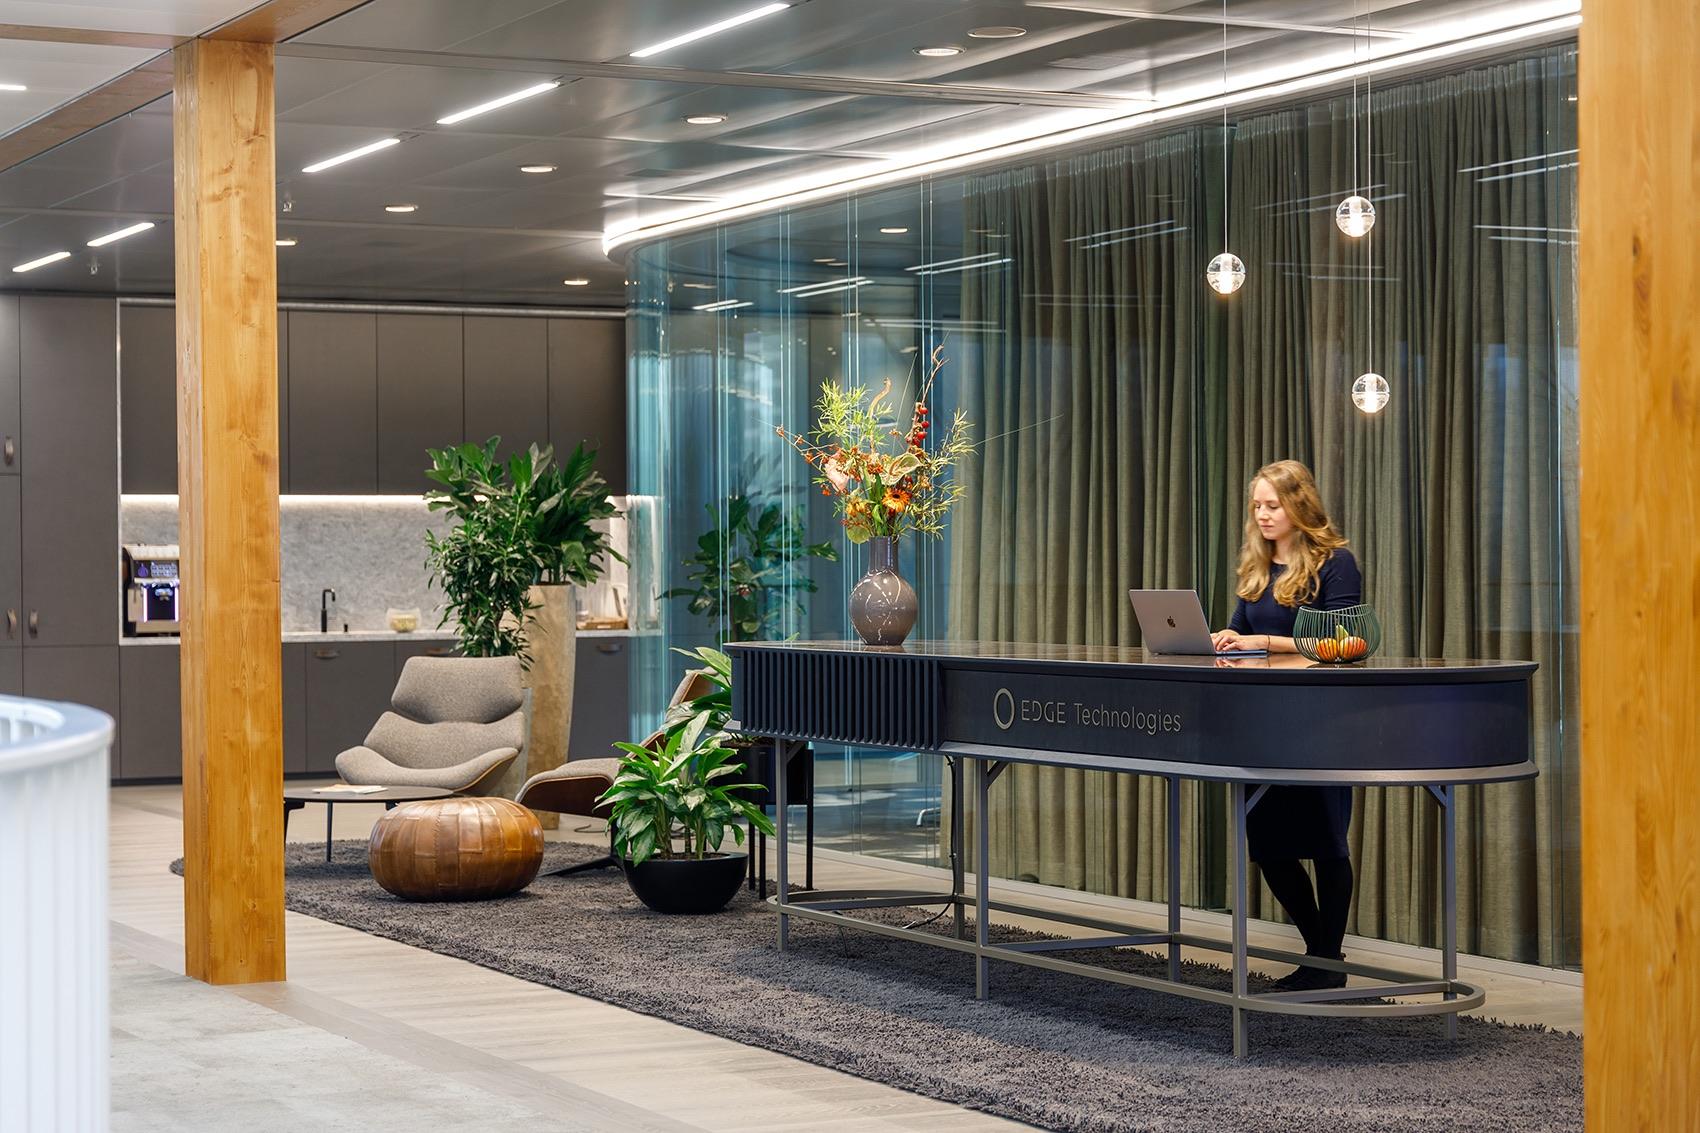 edge-technologies-amsterdam-office-12